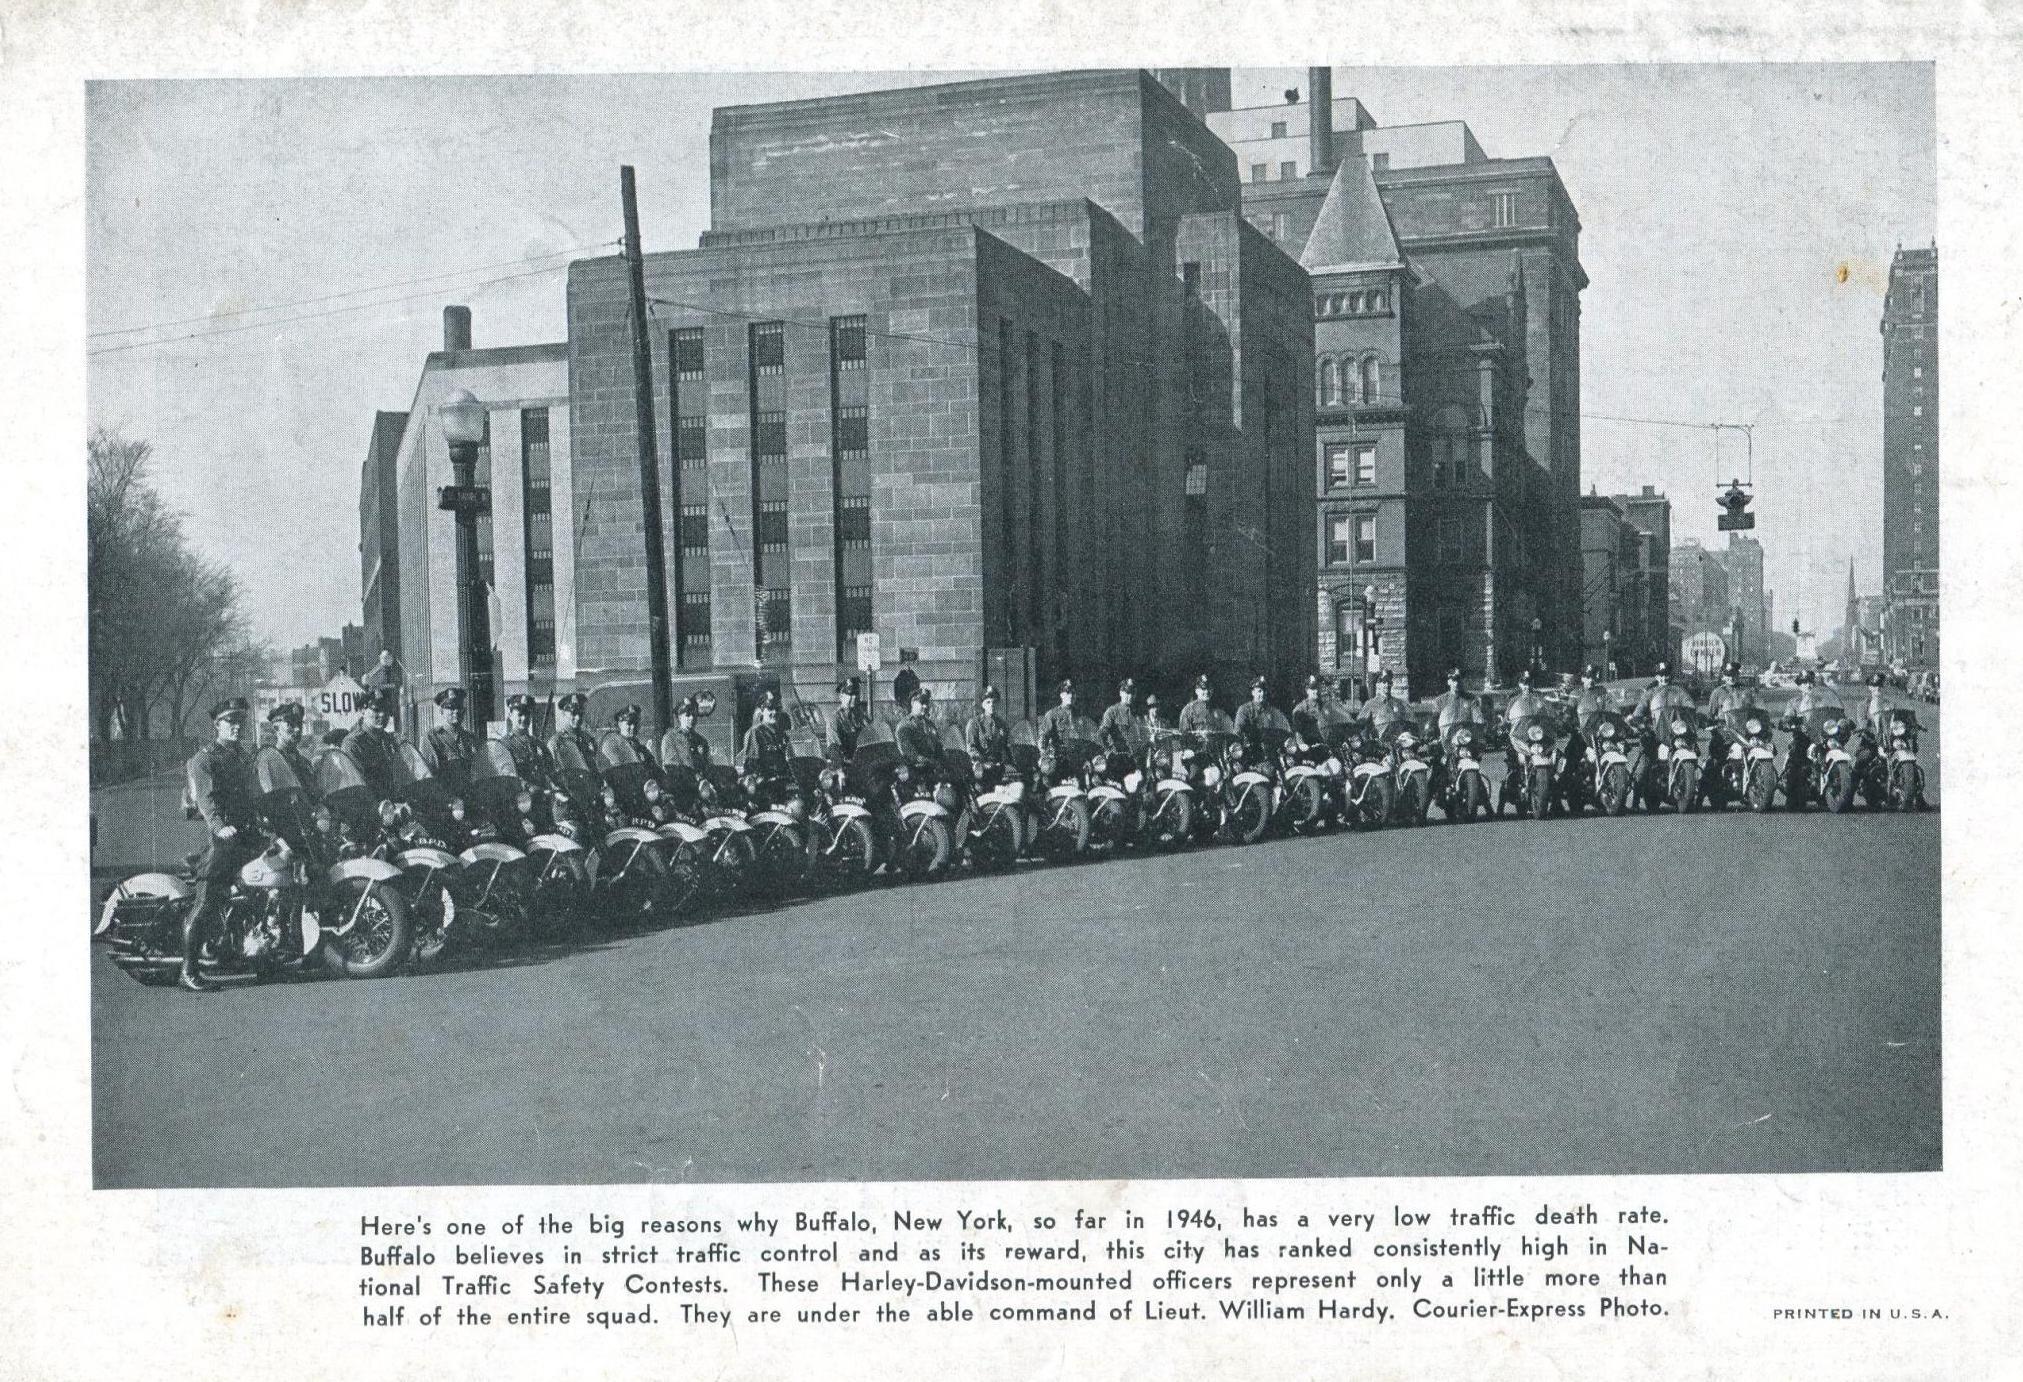 Formación de Knucklehead en Buffalo (New York - 1946)